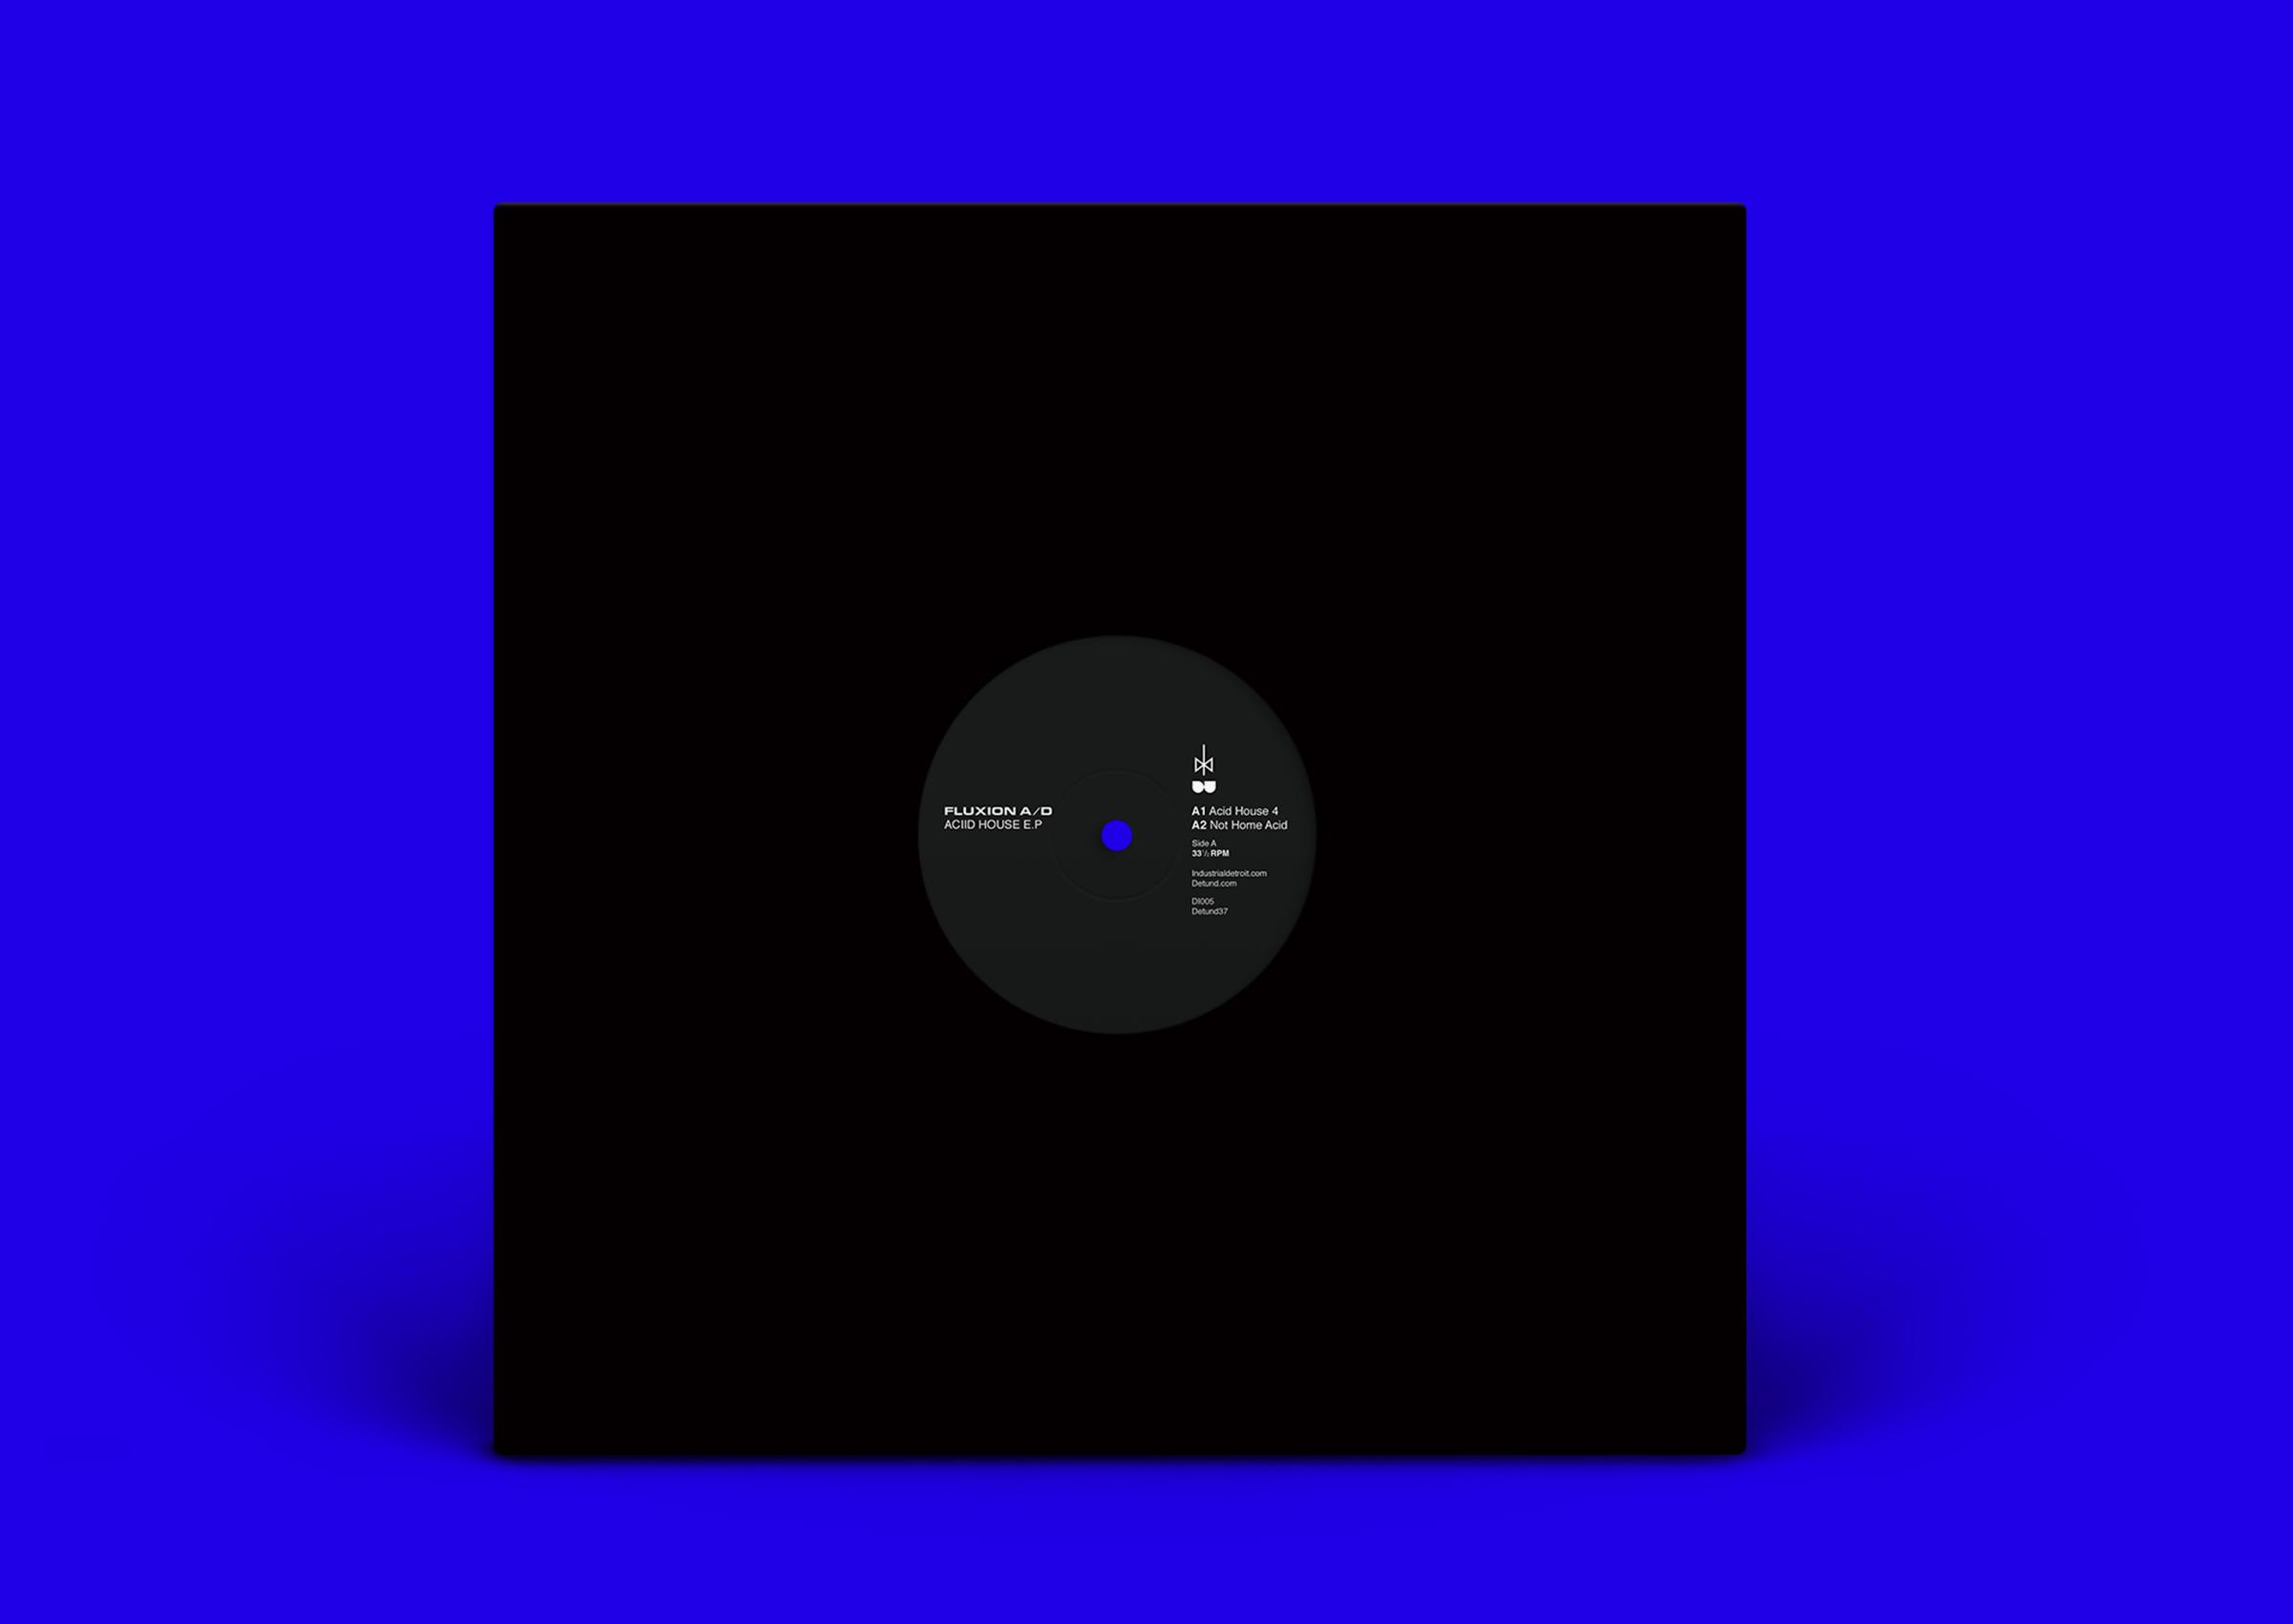 fluxion-record-detail.jpg